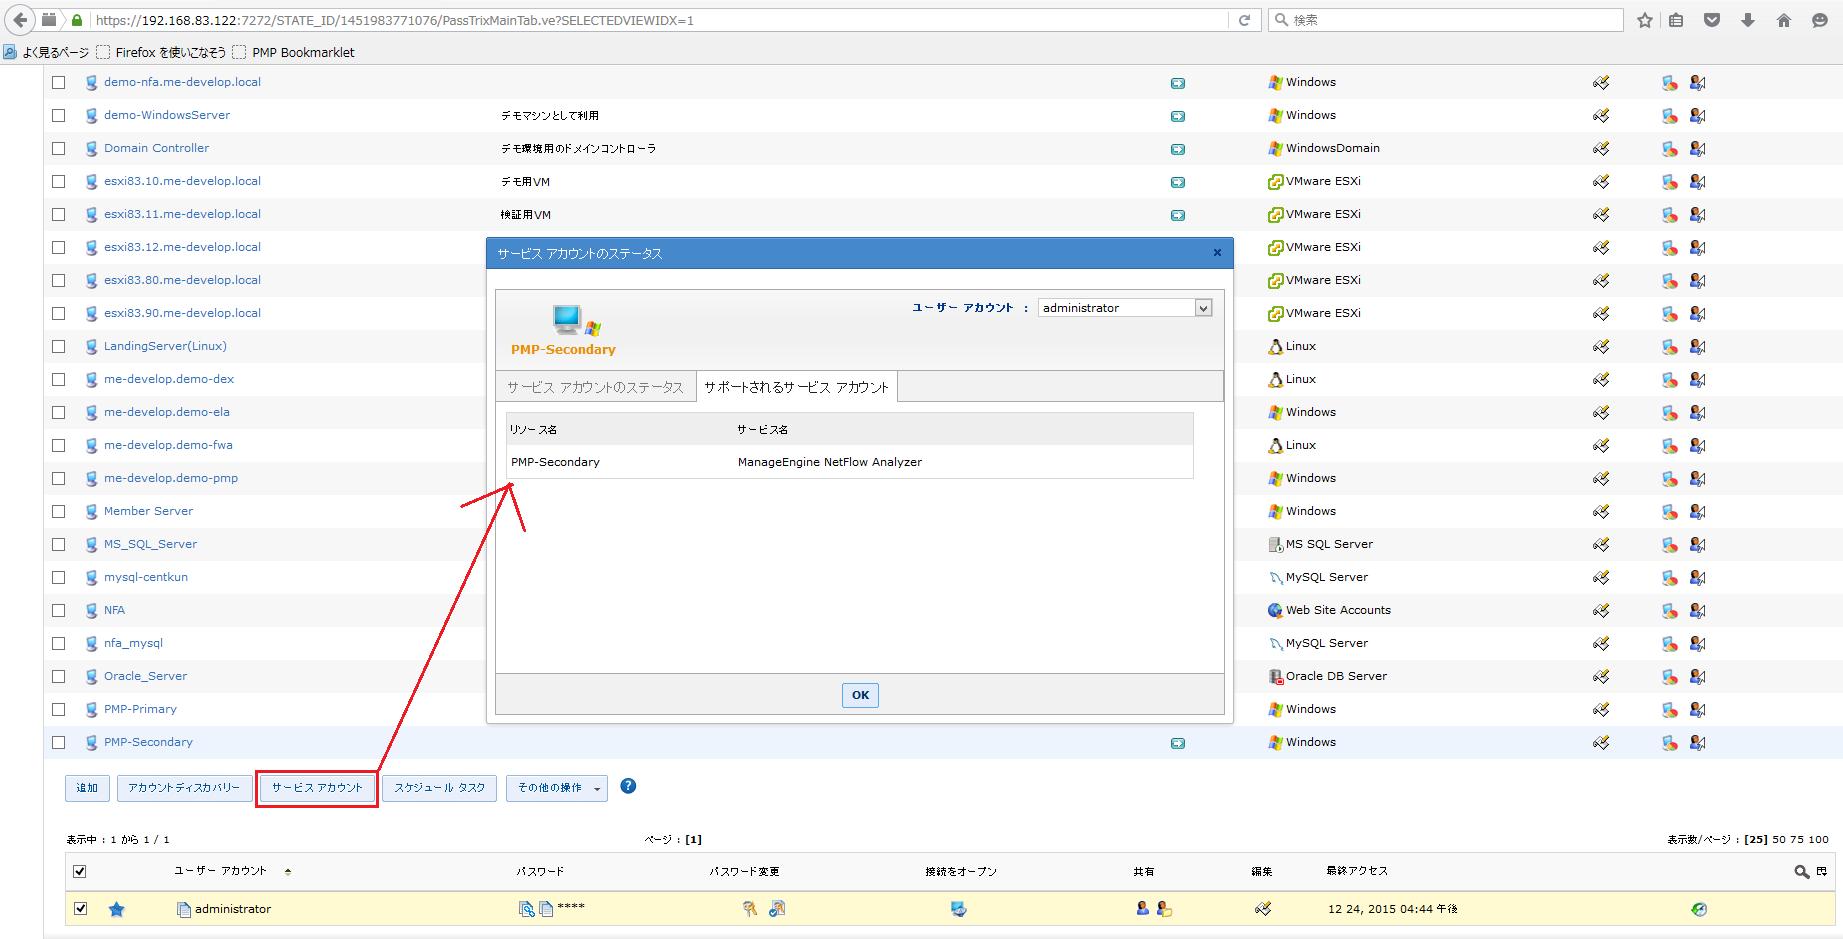 ManageEngine 「Password Manager Pro」アカウントと連動したWindowsサービス検出画面